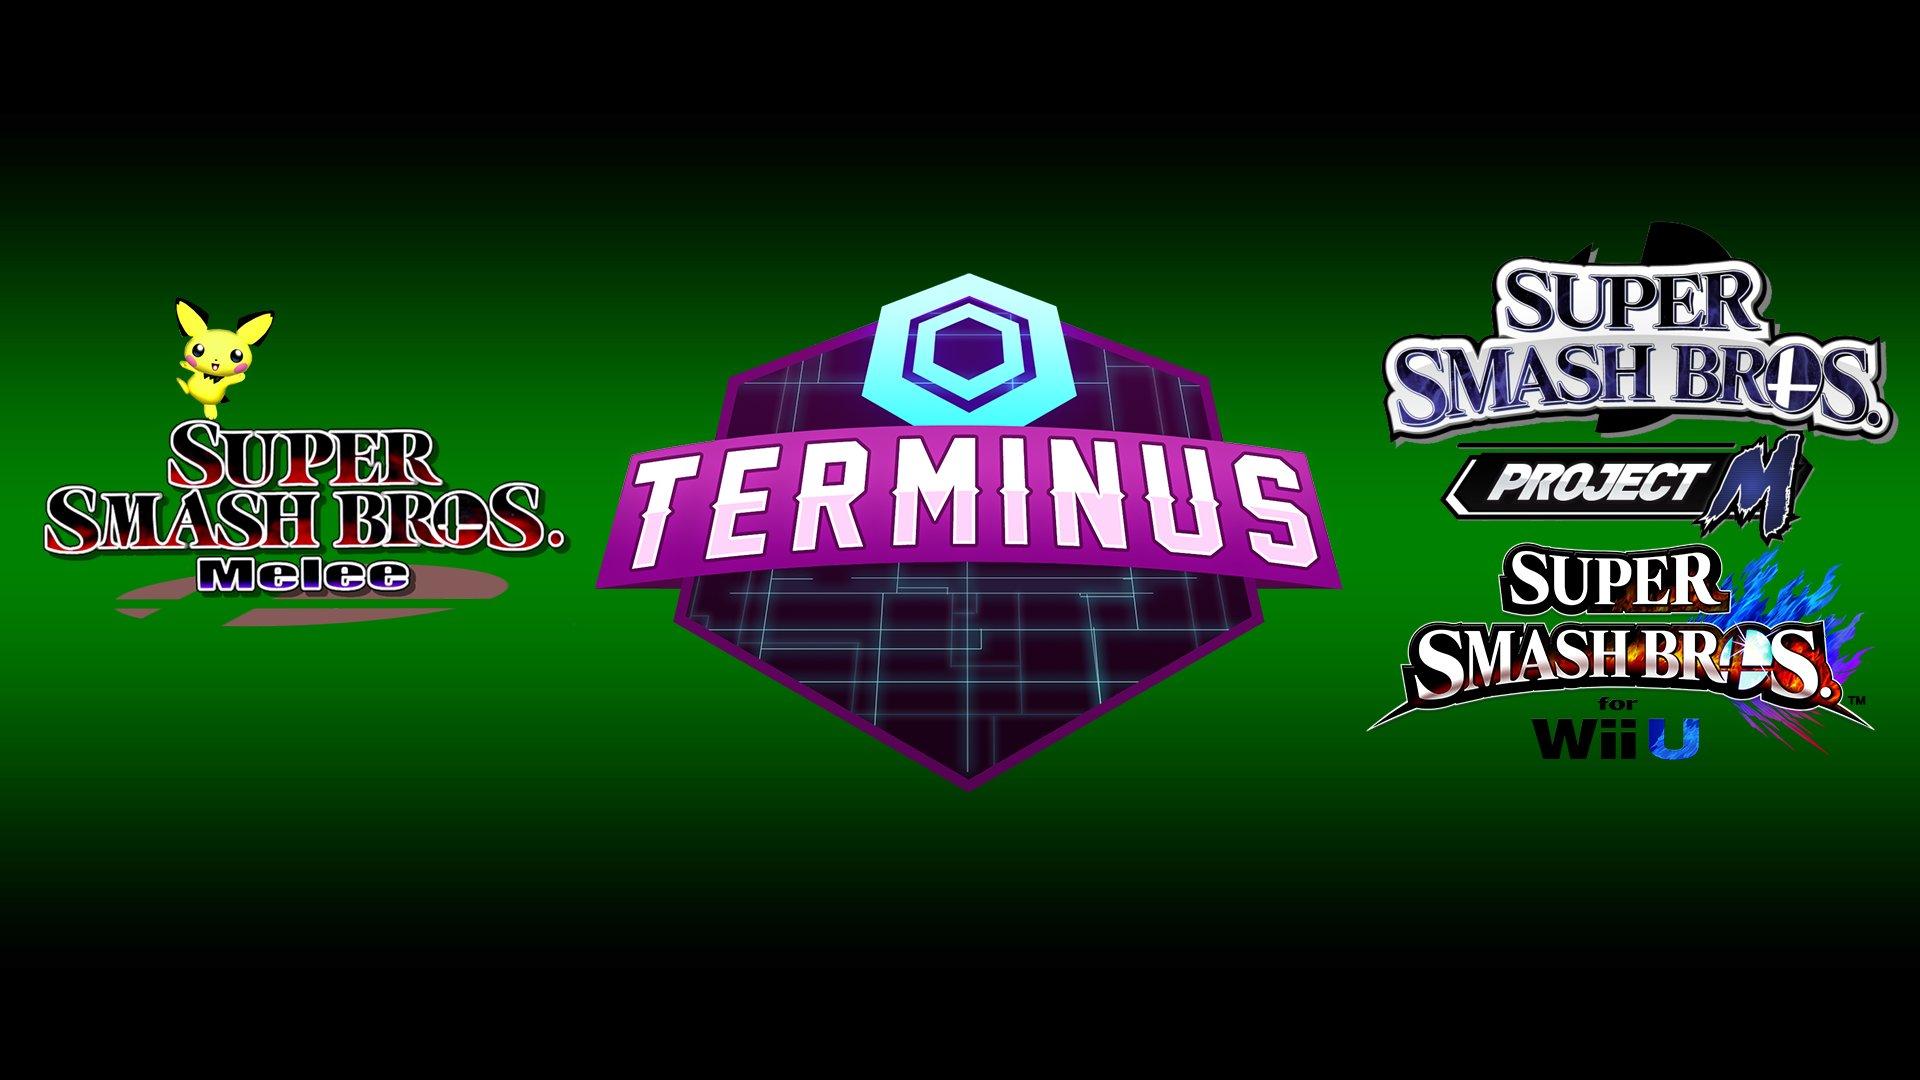 Terminus 3 - Project M Singles